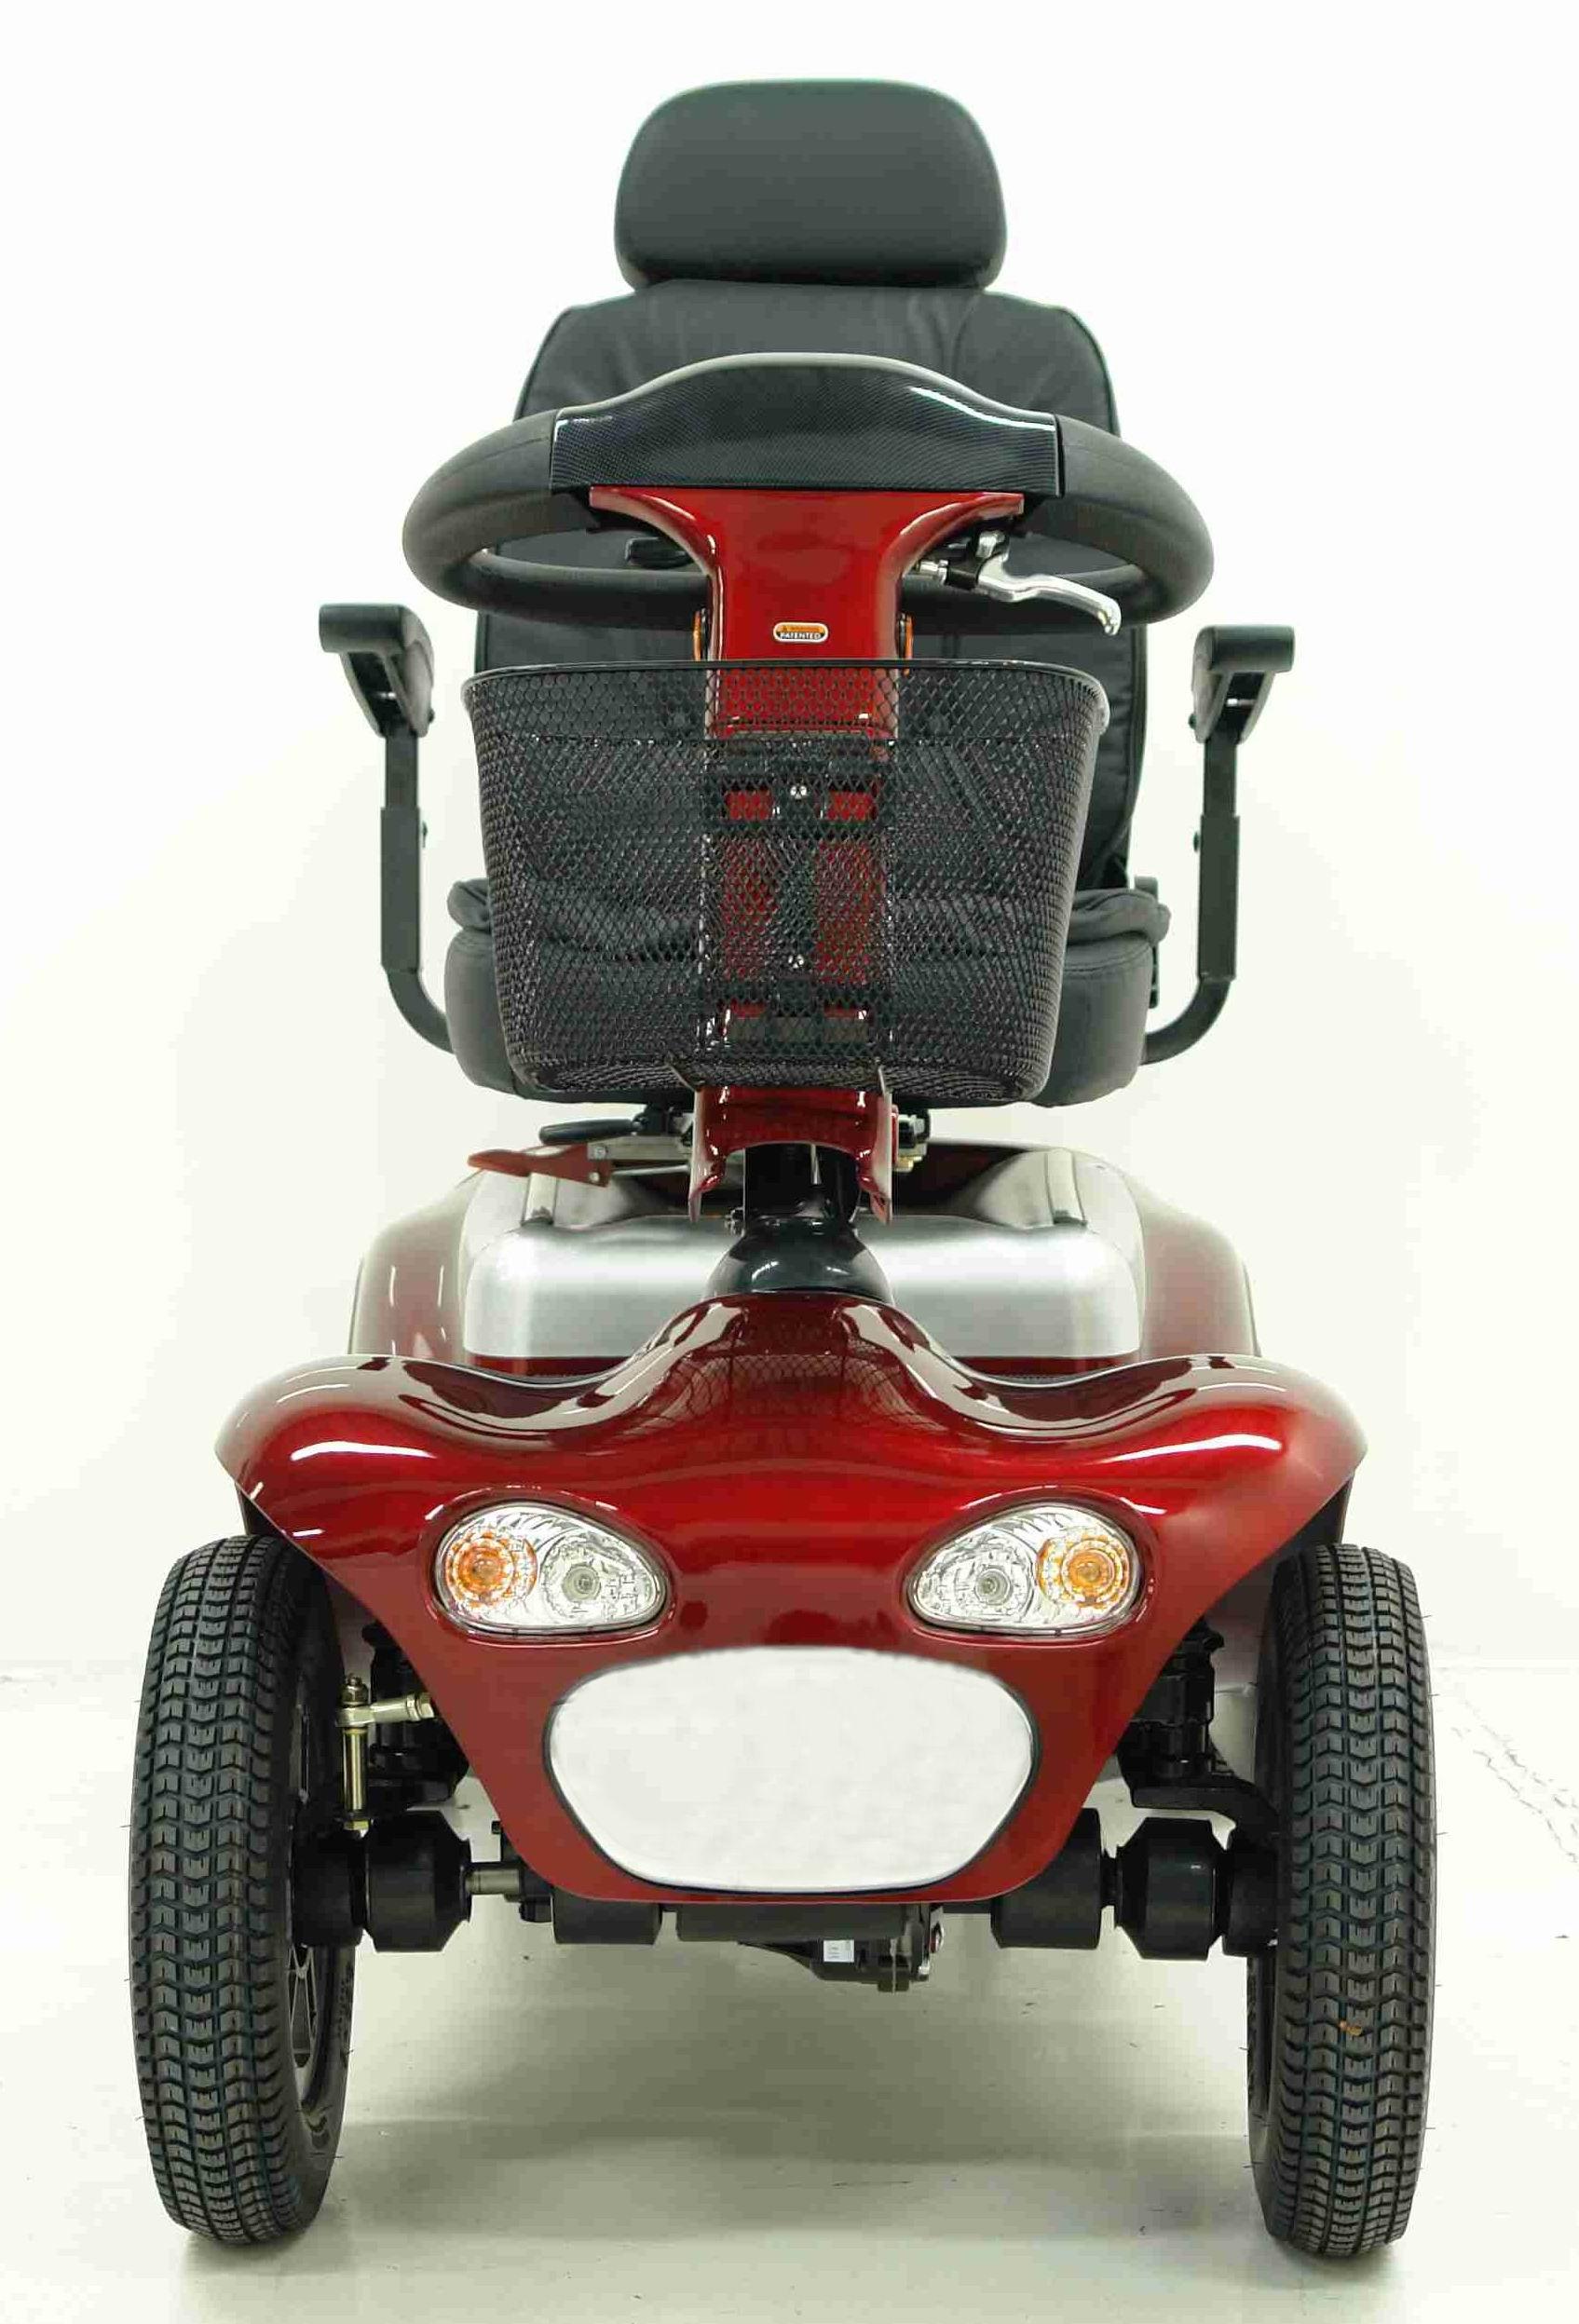 Elektromobil Shoprider Sylt Quattro Te 889 Xlsbf4wd